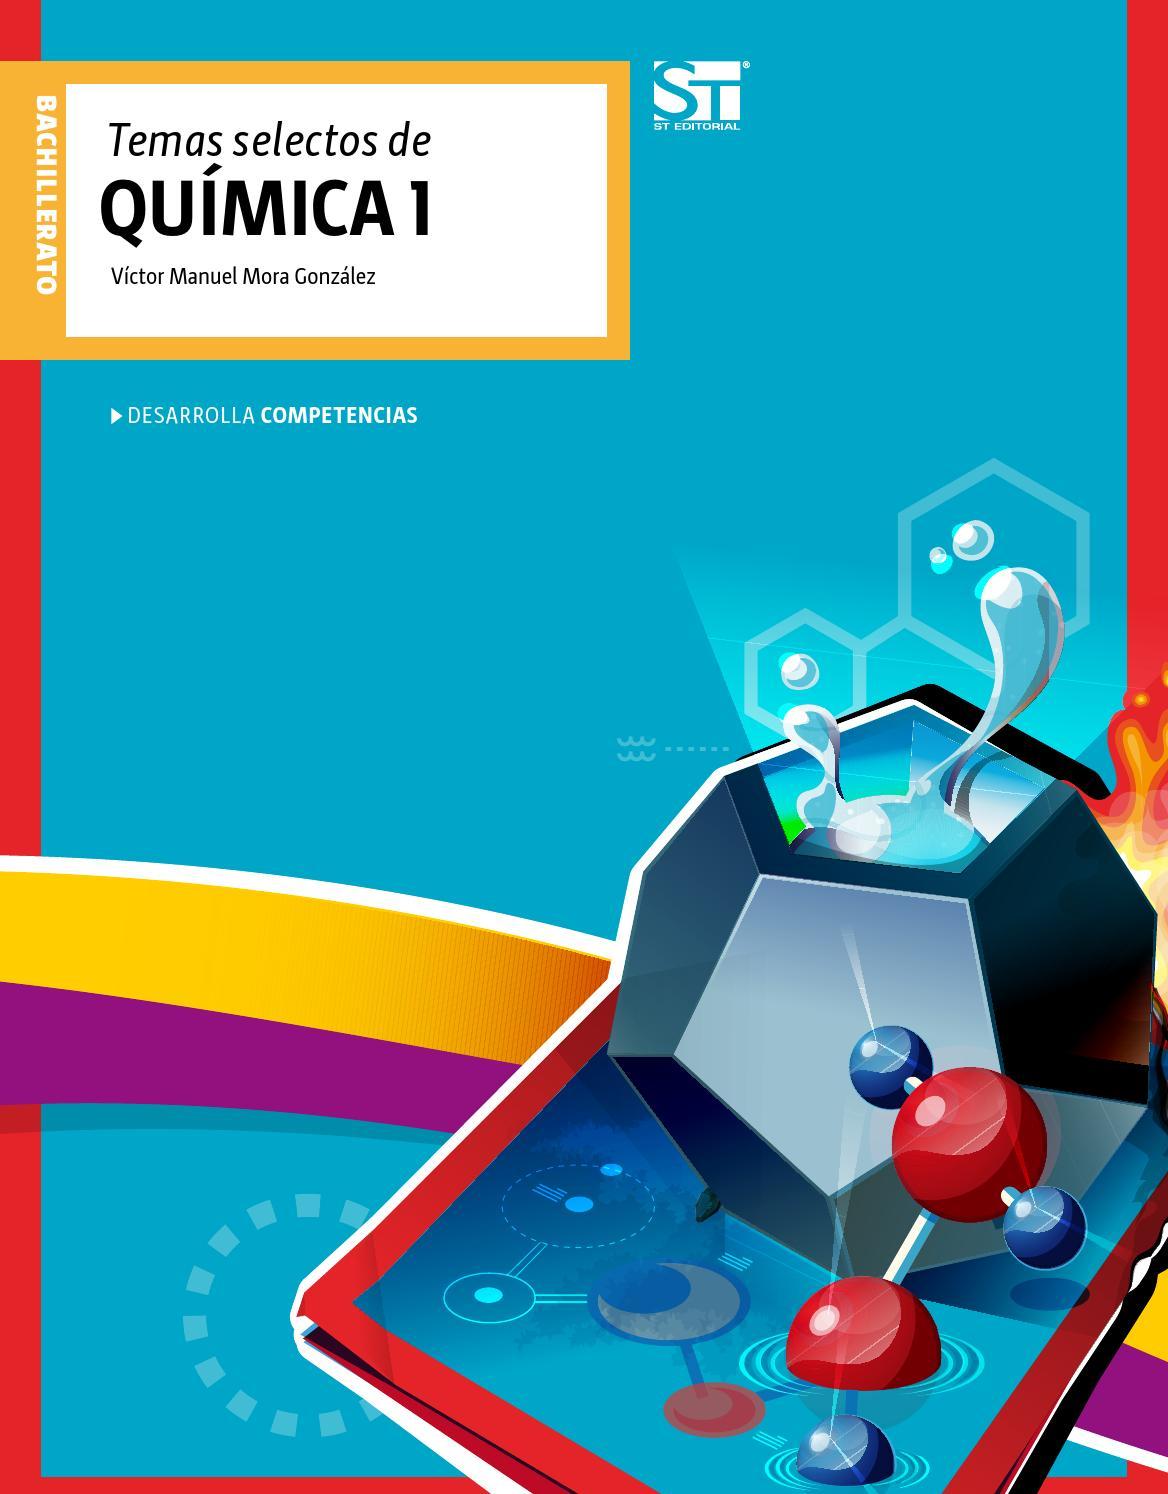 Temas selectos de quimica 1 victor manuel mora gonzalez